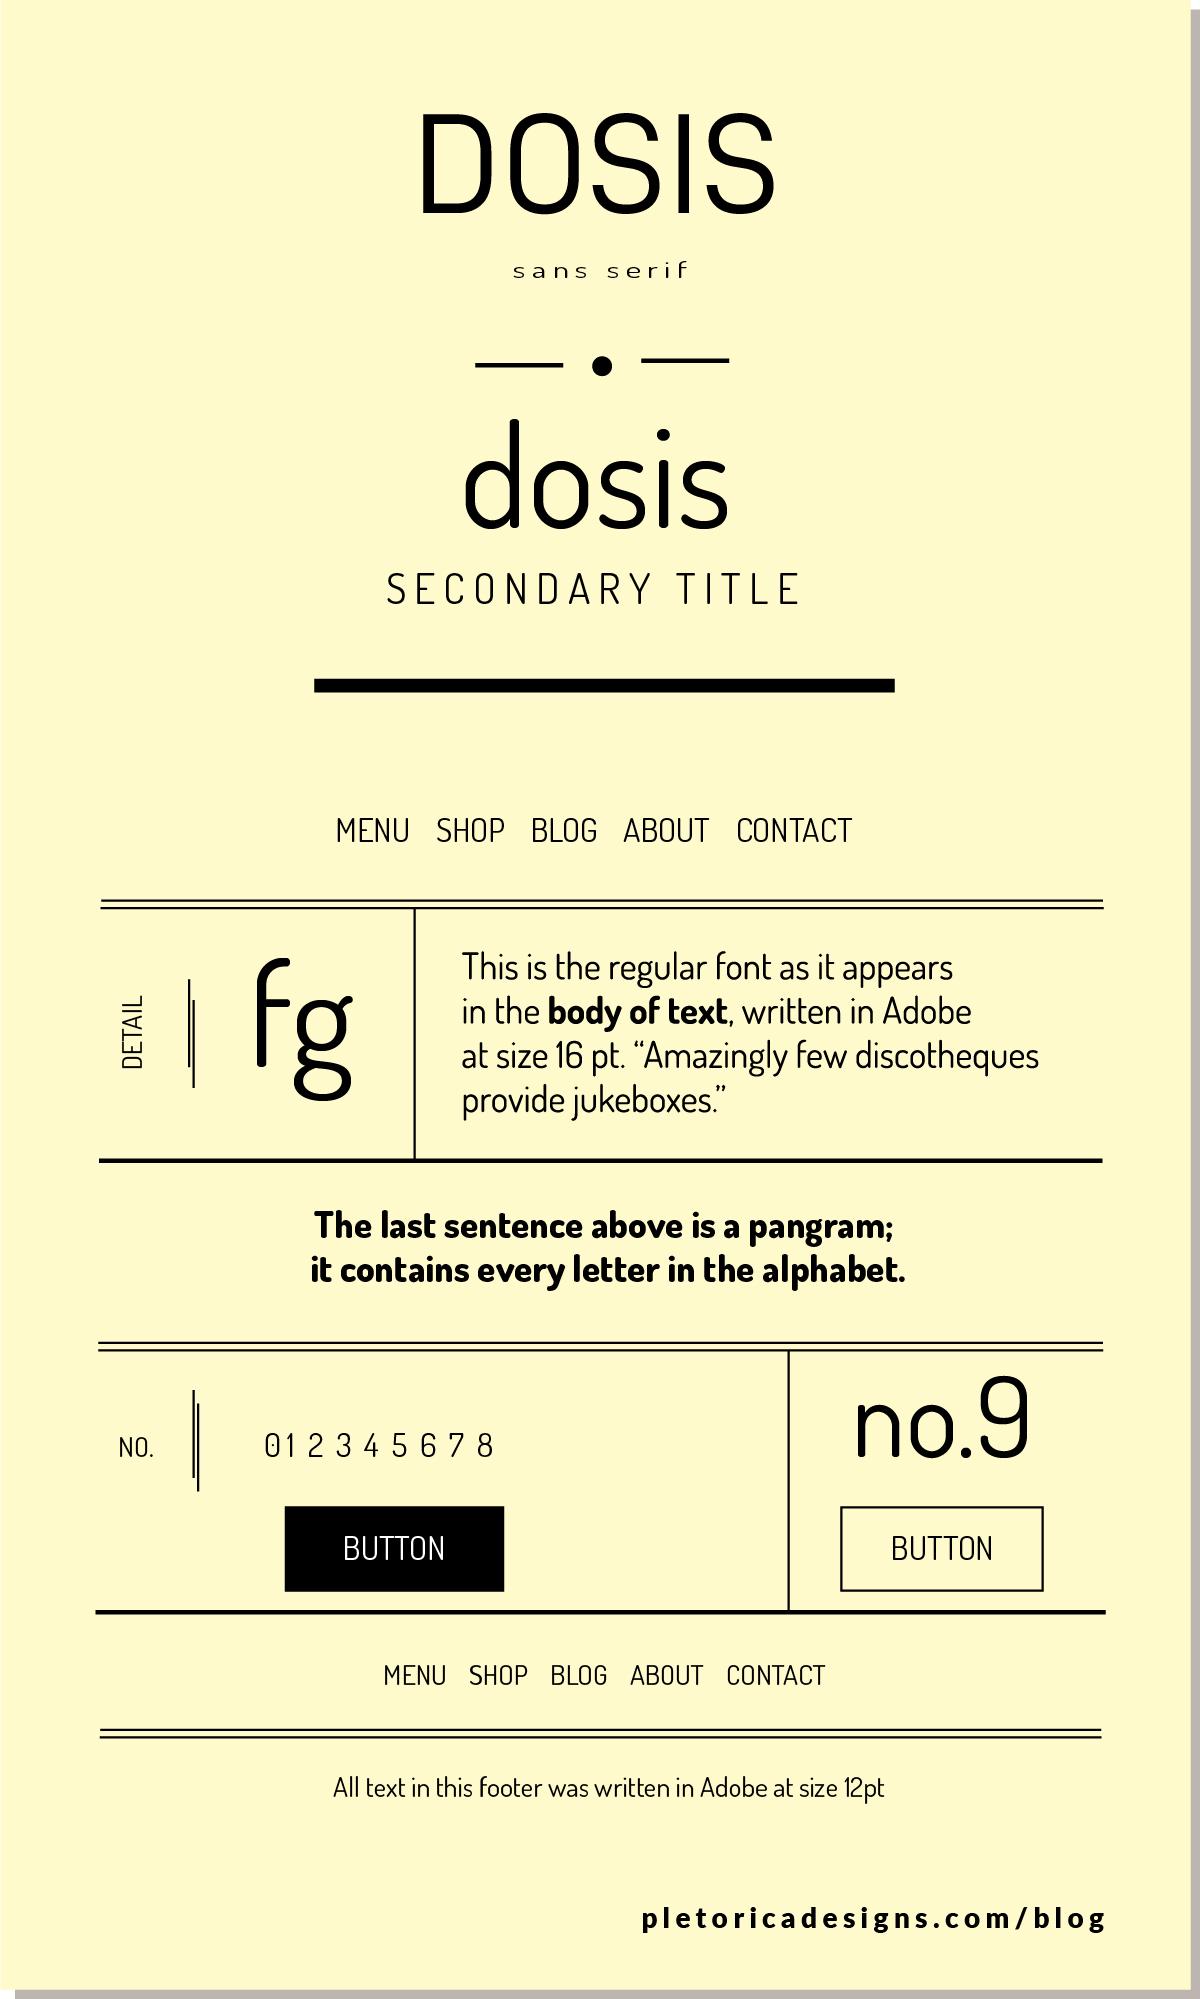 LET'S TYPE: Dosis — PLETÓRICA DESIGNS